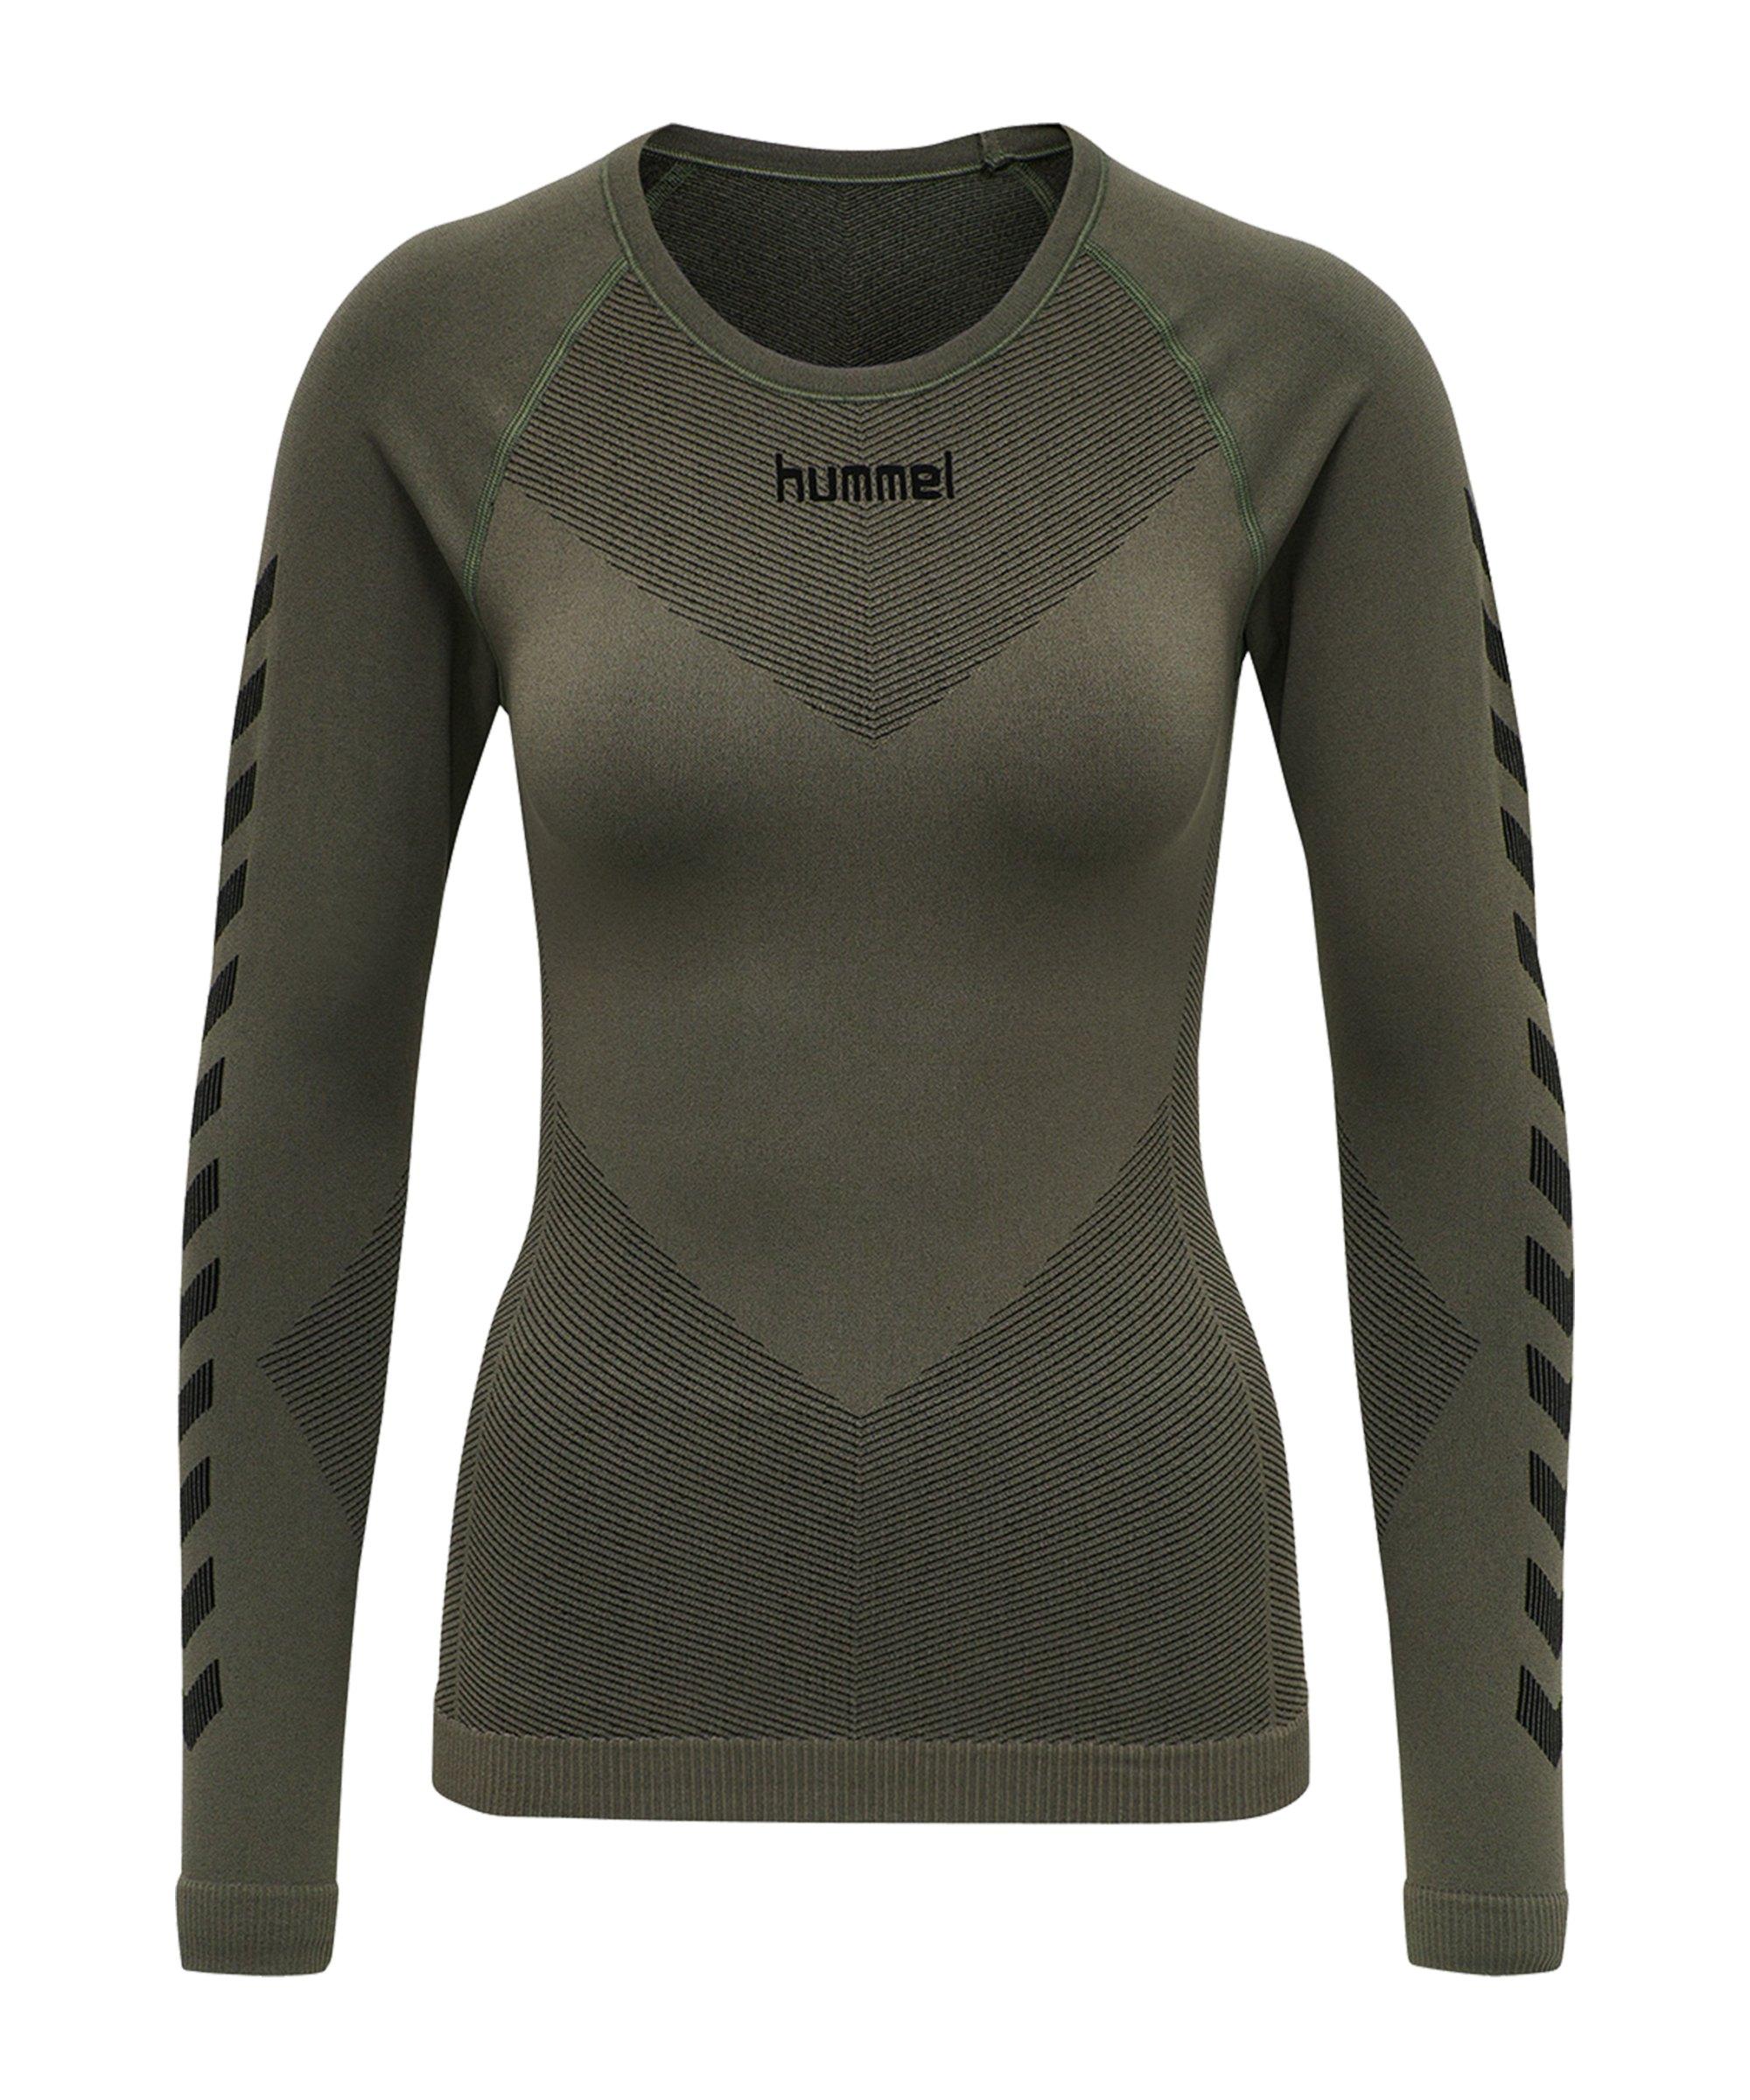 Hummel First Seamless Longsleeve Damen Khaki F6084 - khaki